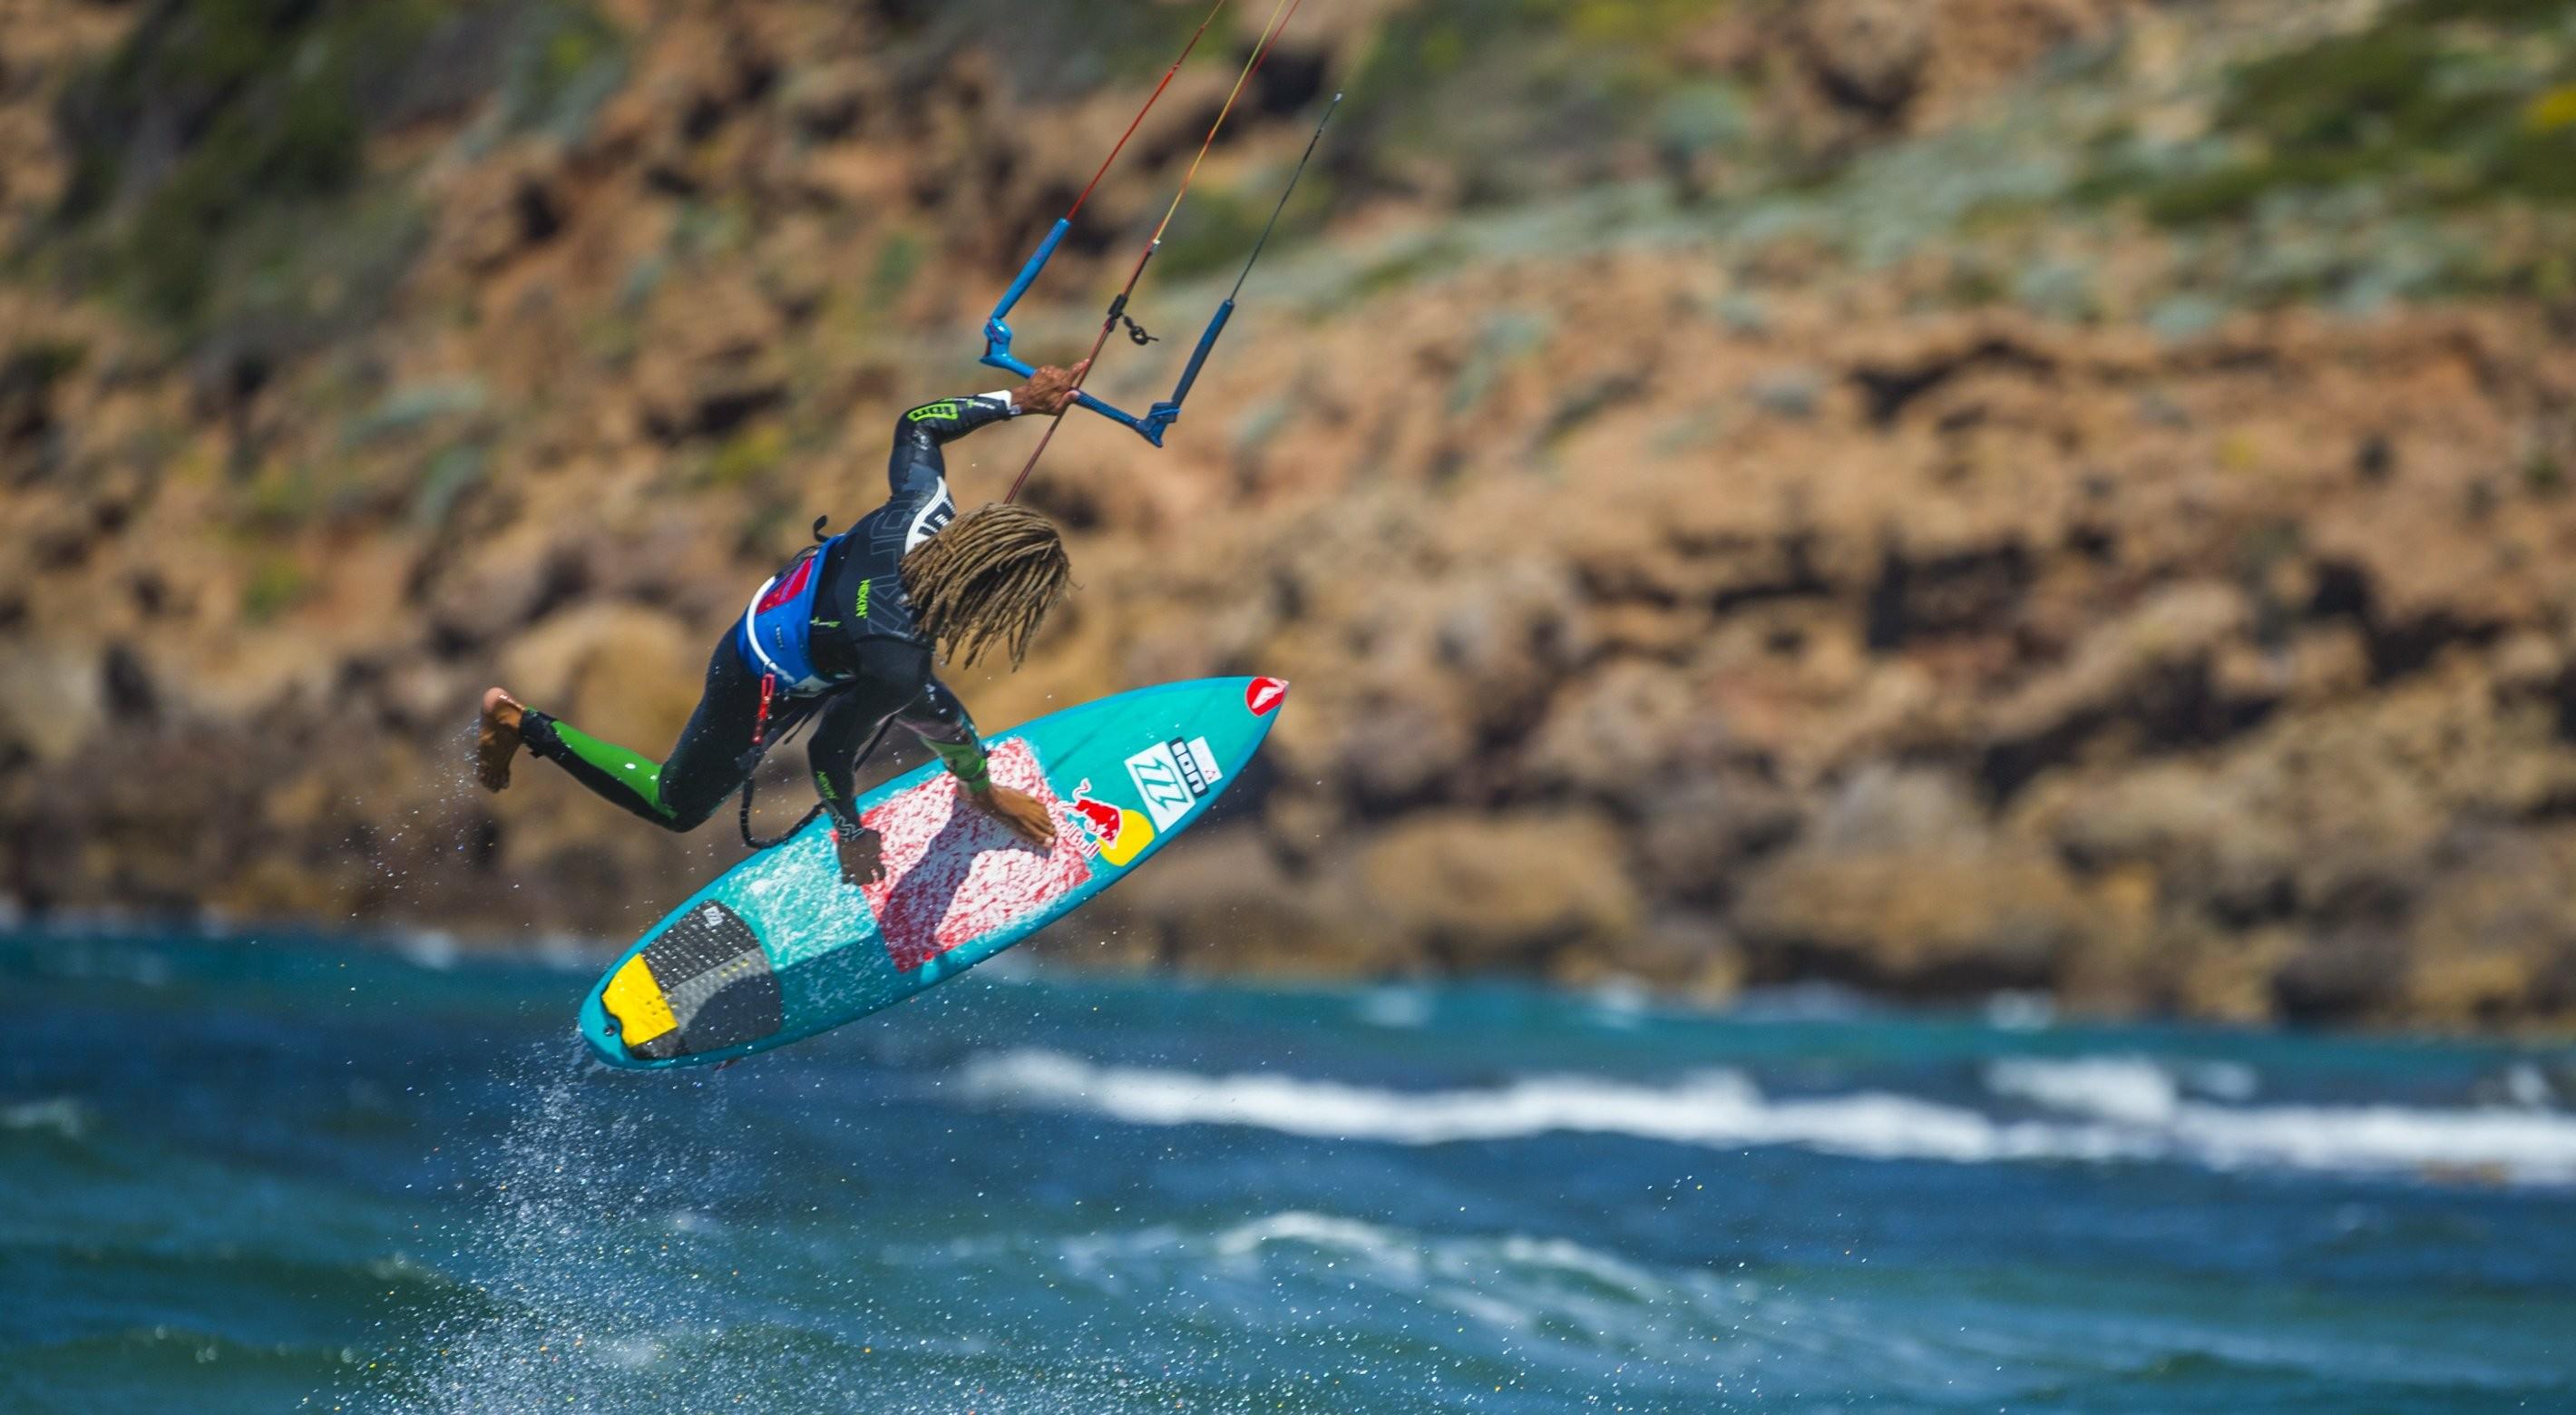 Strapless kitesurf au Red Bull Unfastened 2014